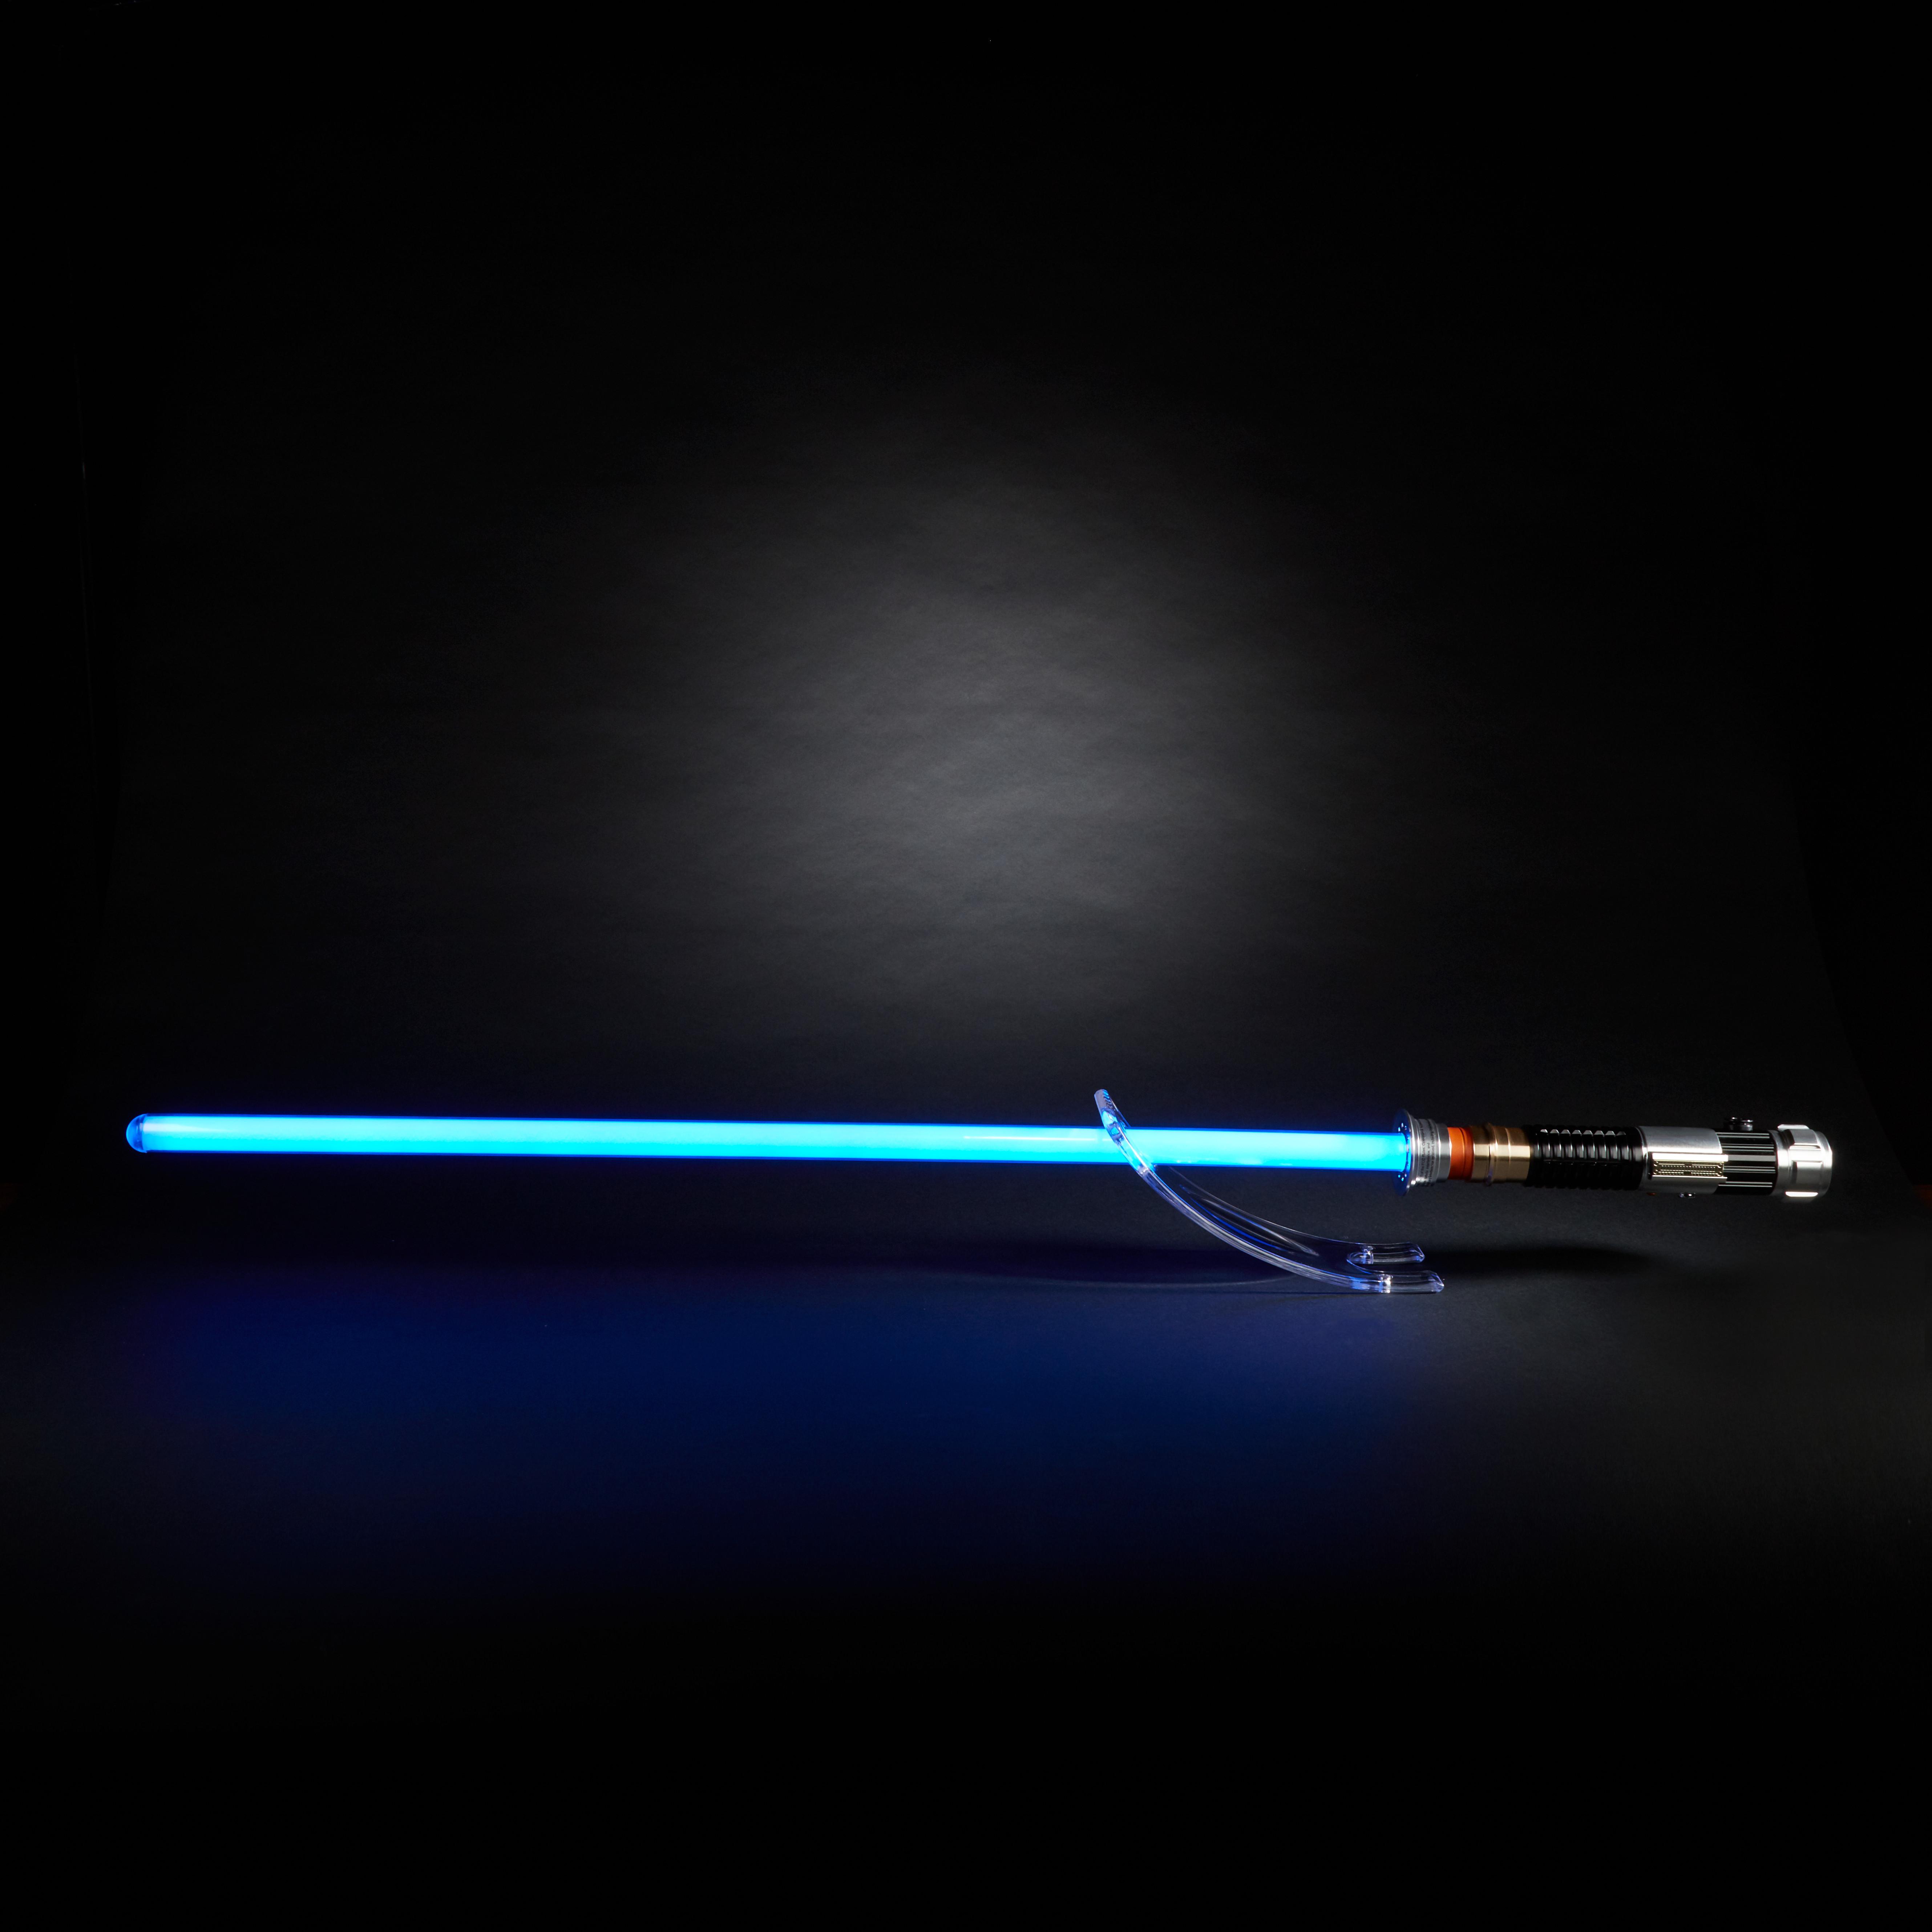 STAR WARS THE BLACK SERIES FORCE FX LIGHTSABER Assortment - Obi-Wan Kenobi (2)